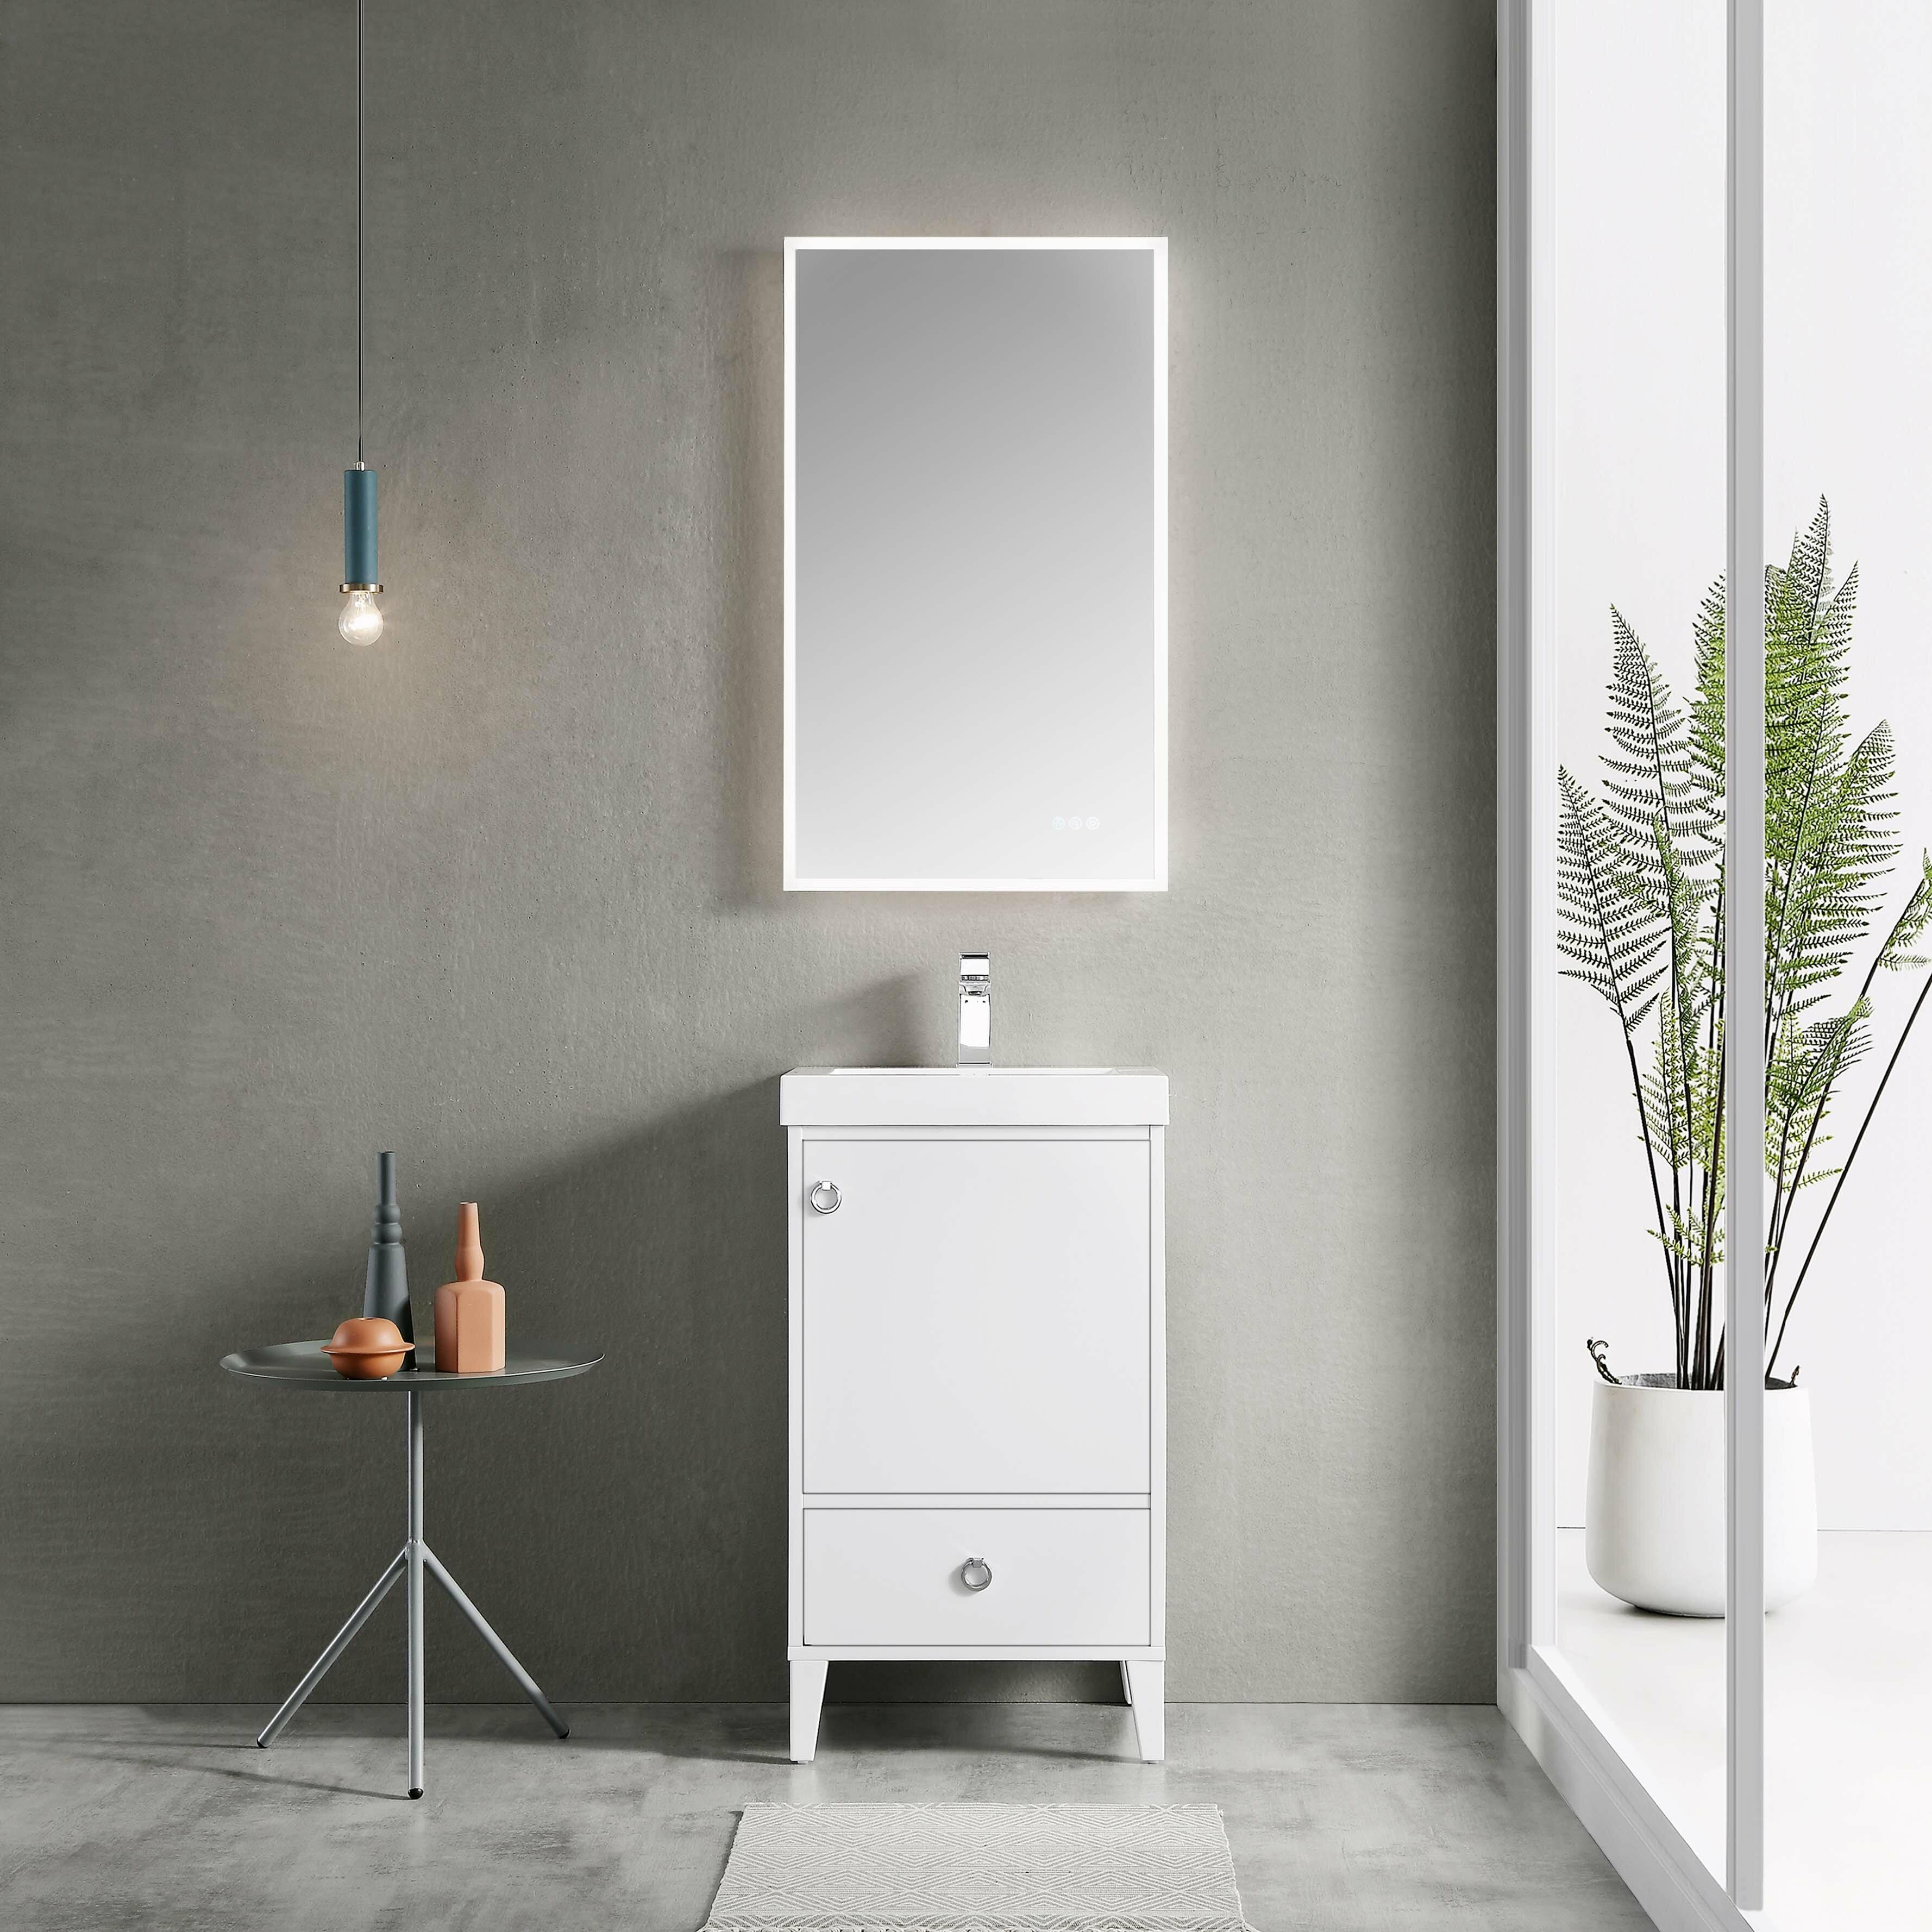 Ebern Designs Jez Waterproof Ergonomic Design 20 Single Bathroom Vanity Wayfair